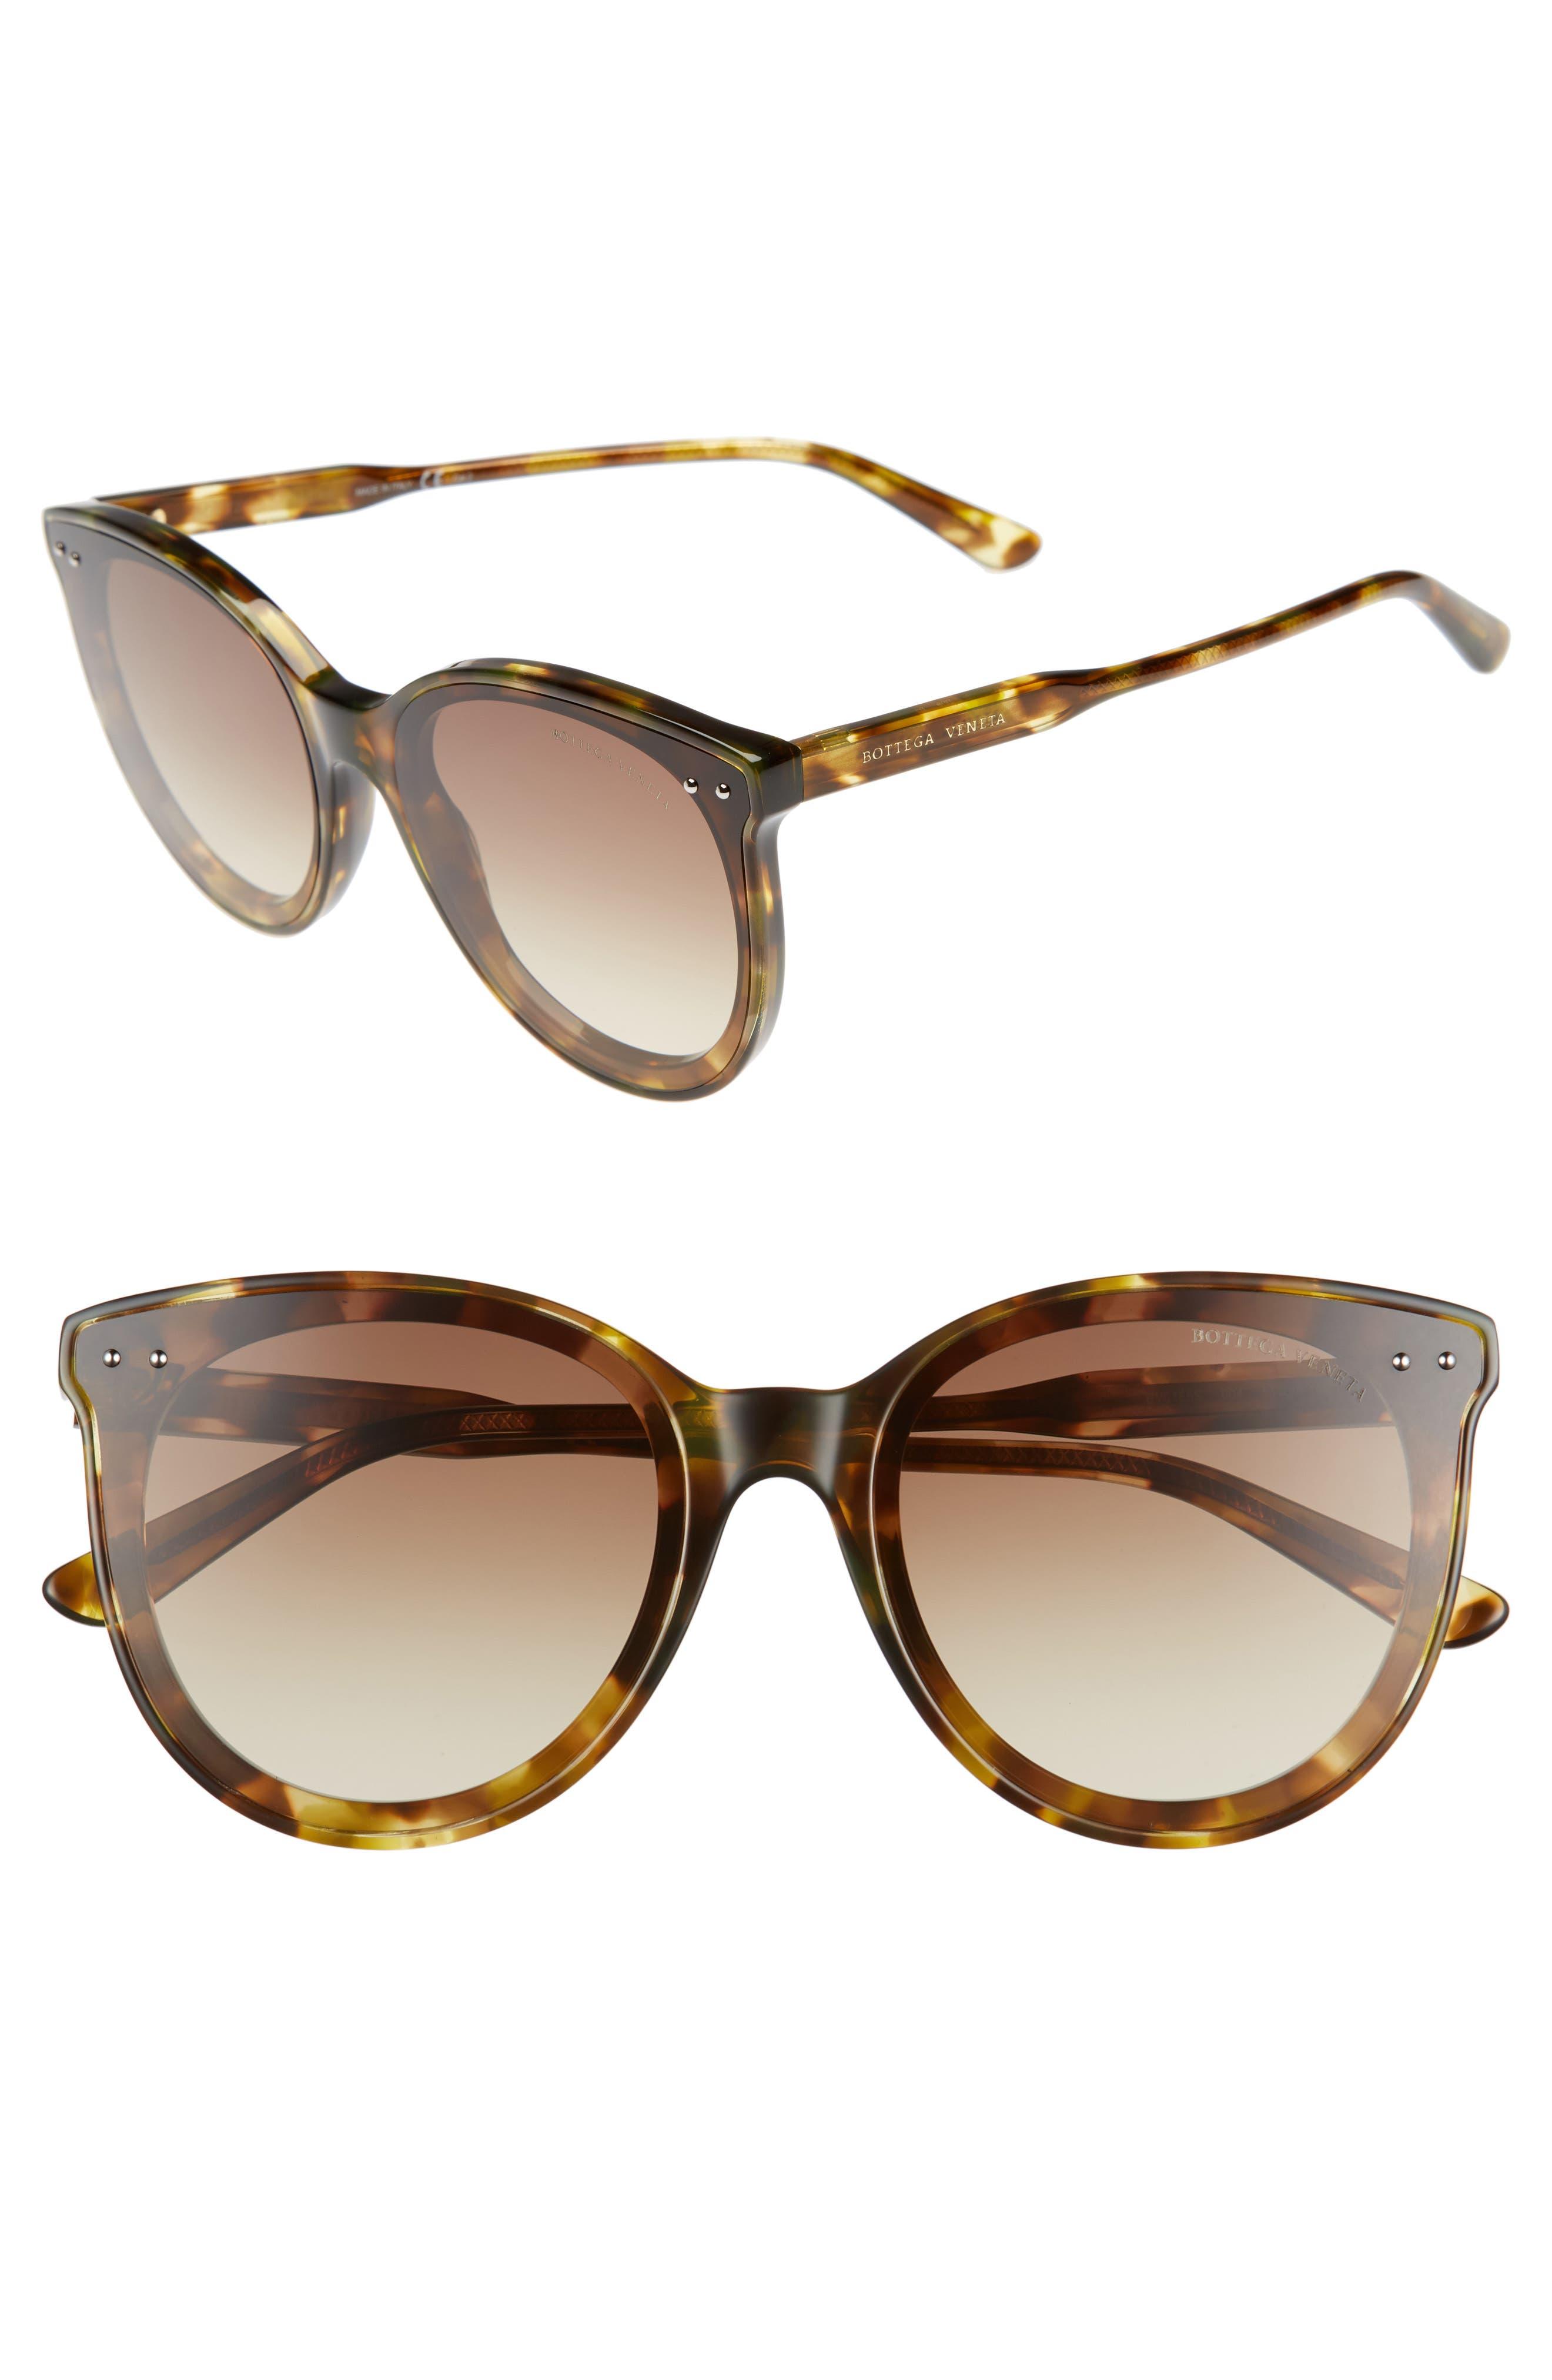 61mm Cat Eye Sunglasses,                             Main thumbnail 1, color,                             GREEN HAVANA